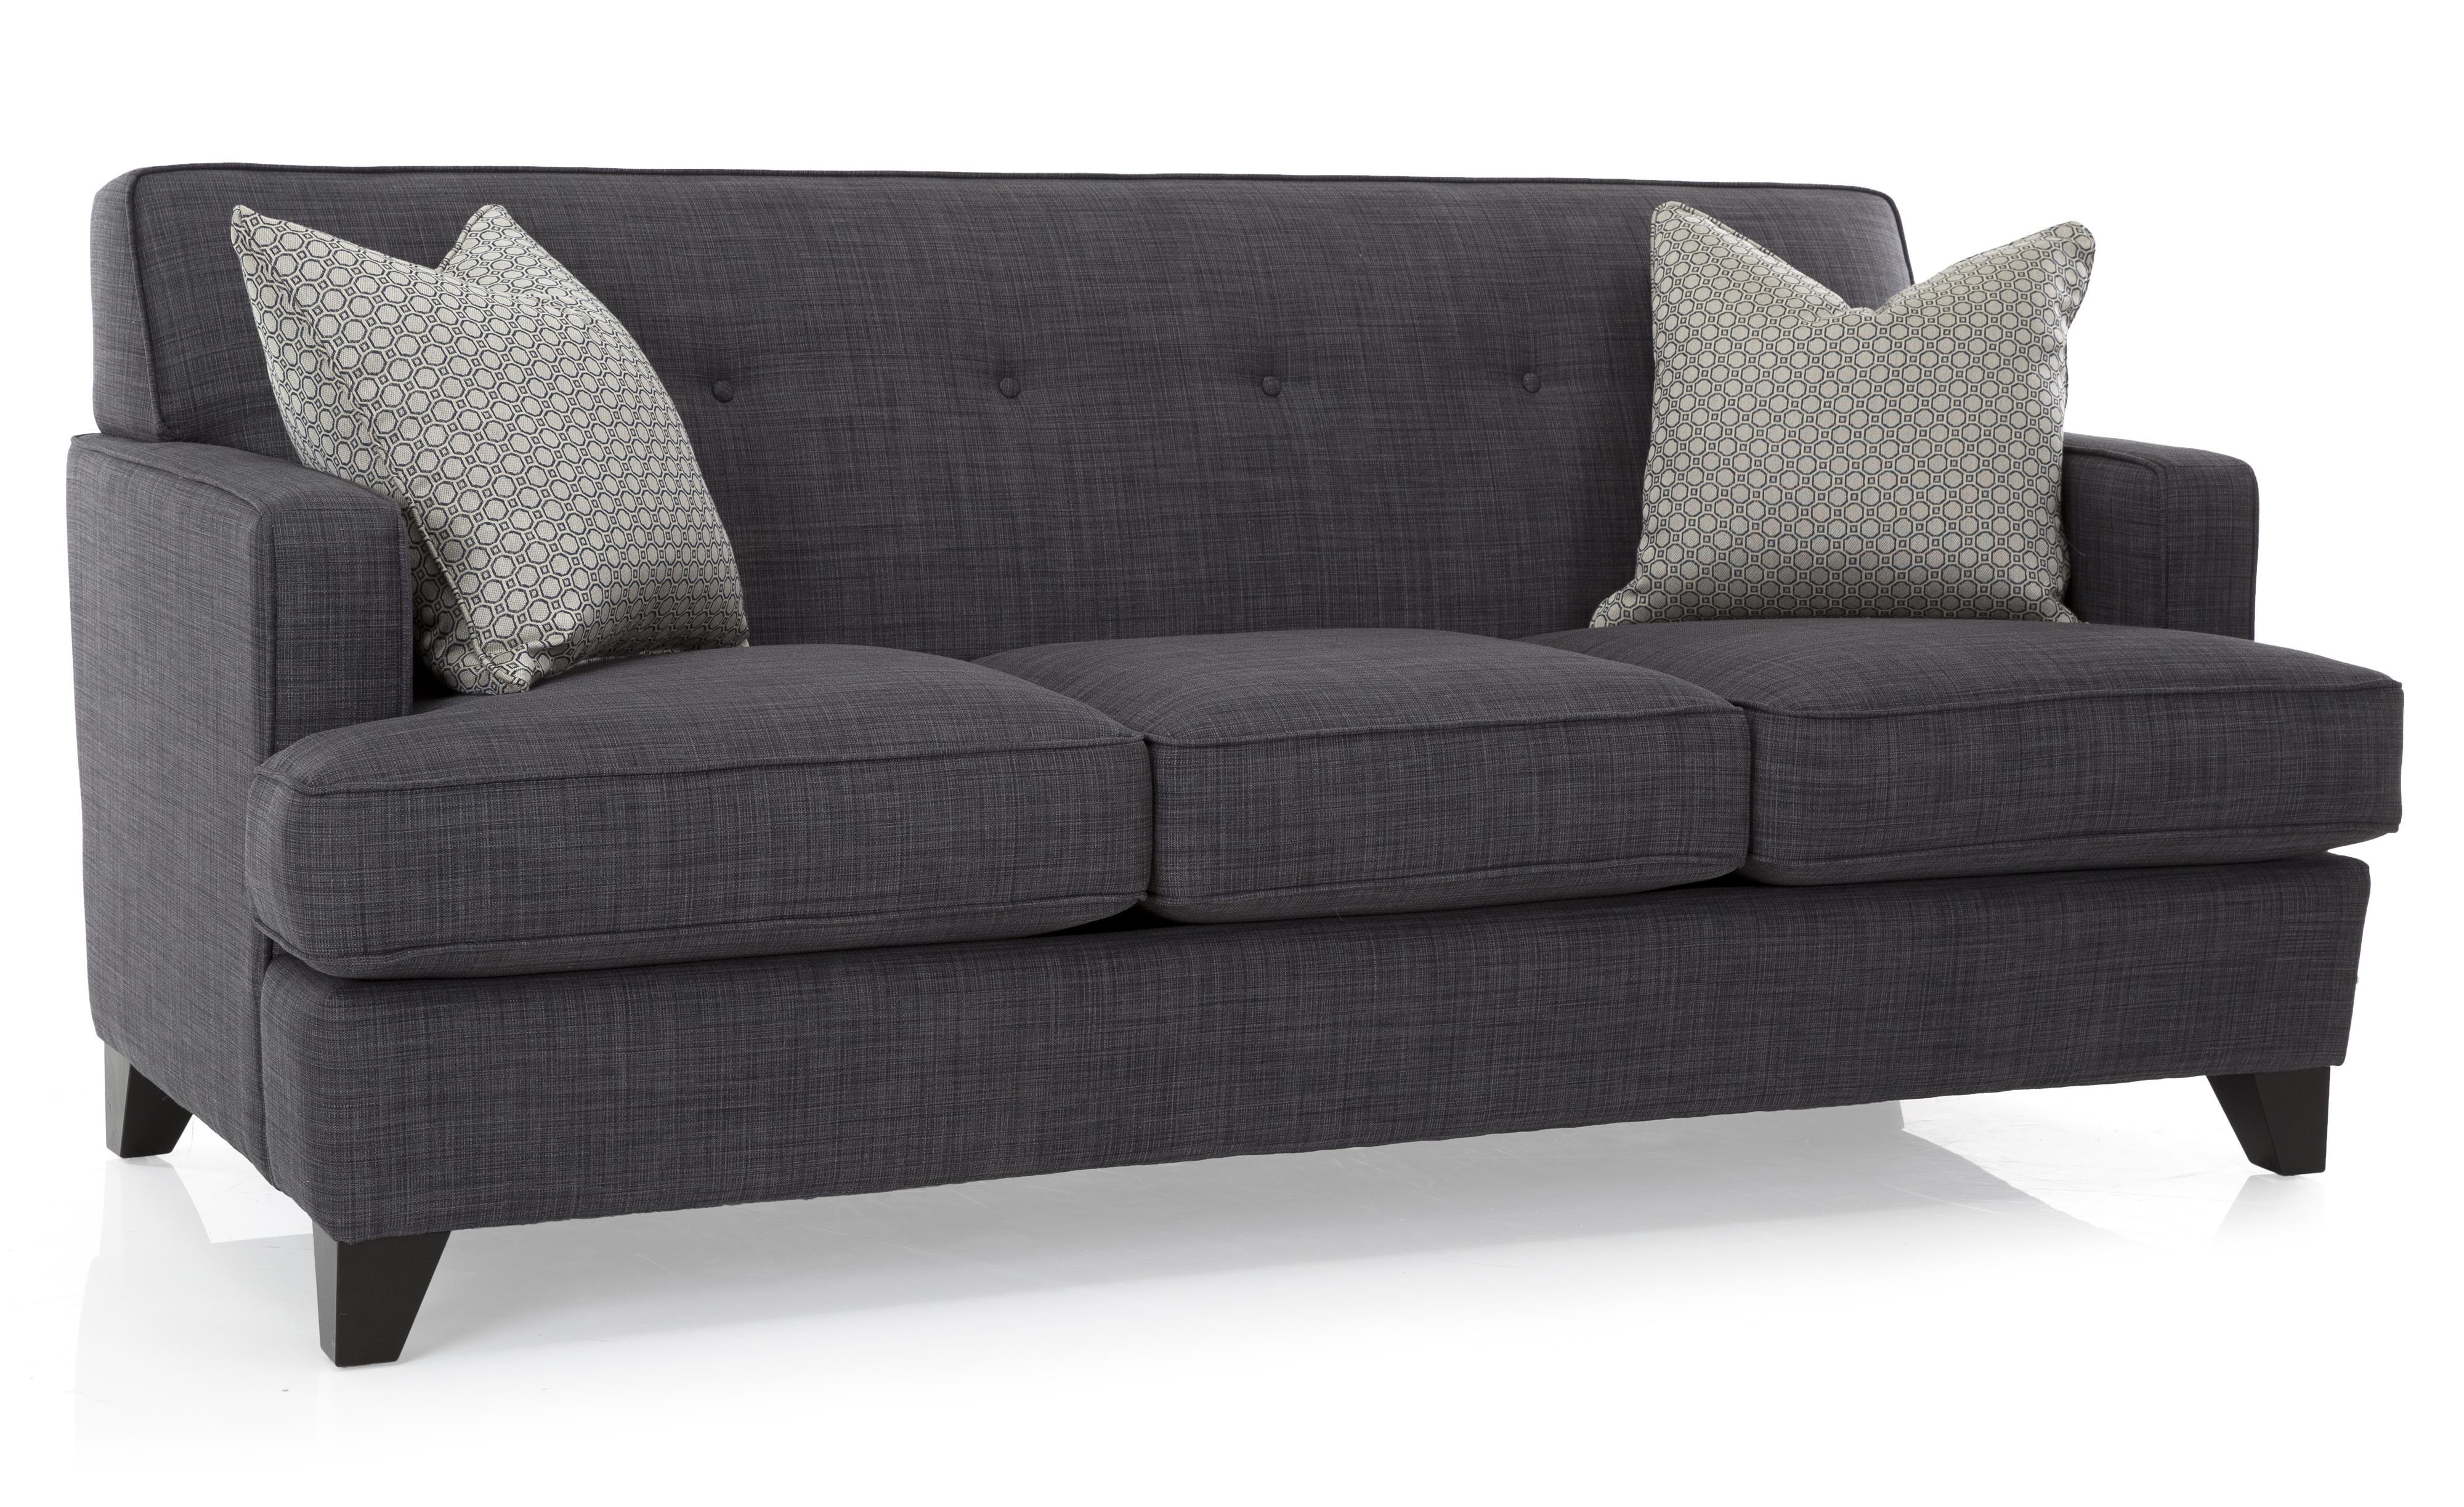 Decor-Rest 2532 Sofa - Item Number: 2532-Sofa-Dark-Grey-Solid